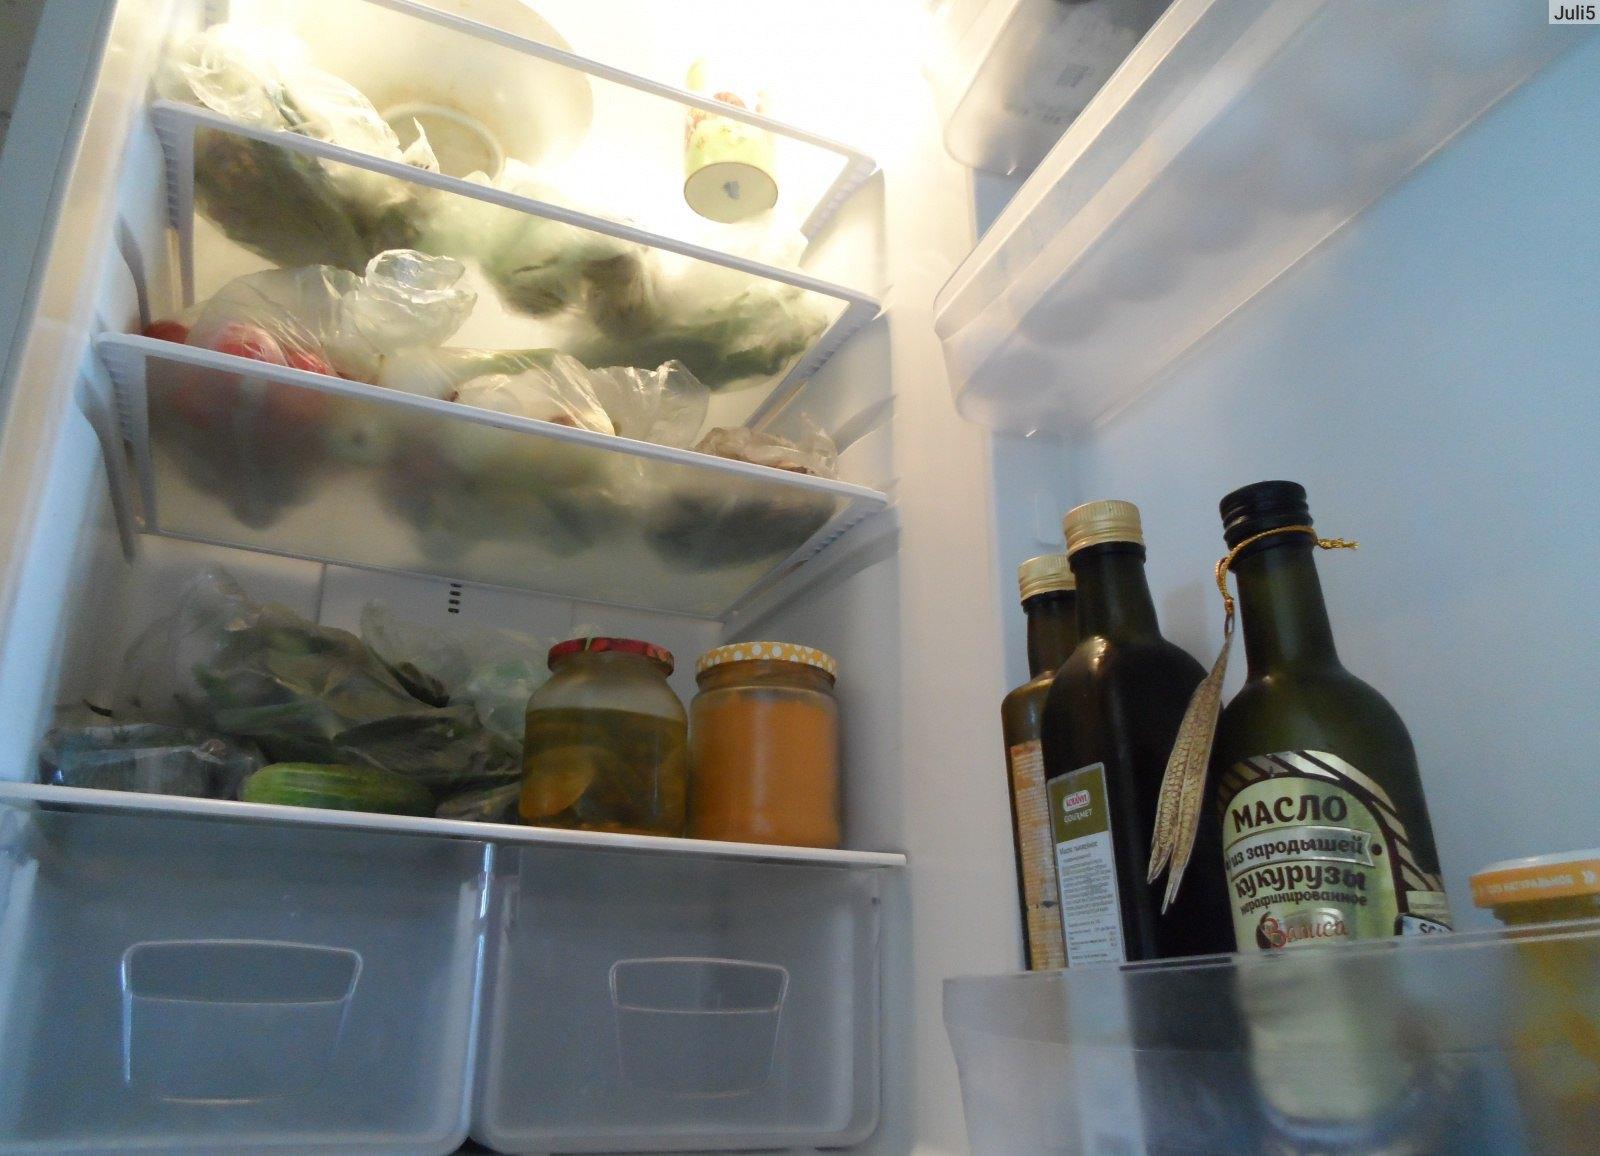 ноу фрост холодильник